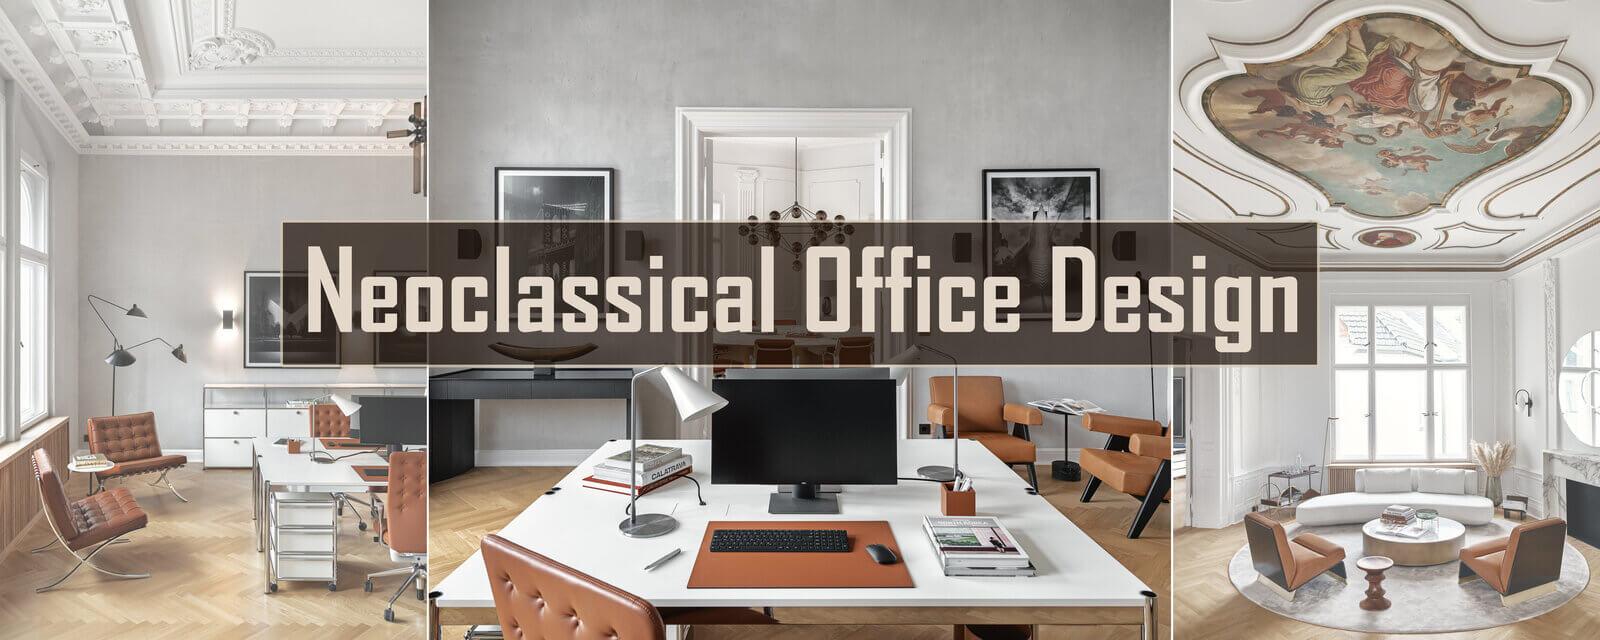 Neoclassical Office Design